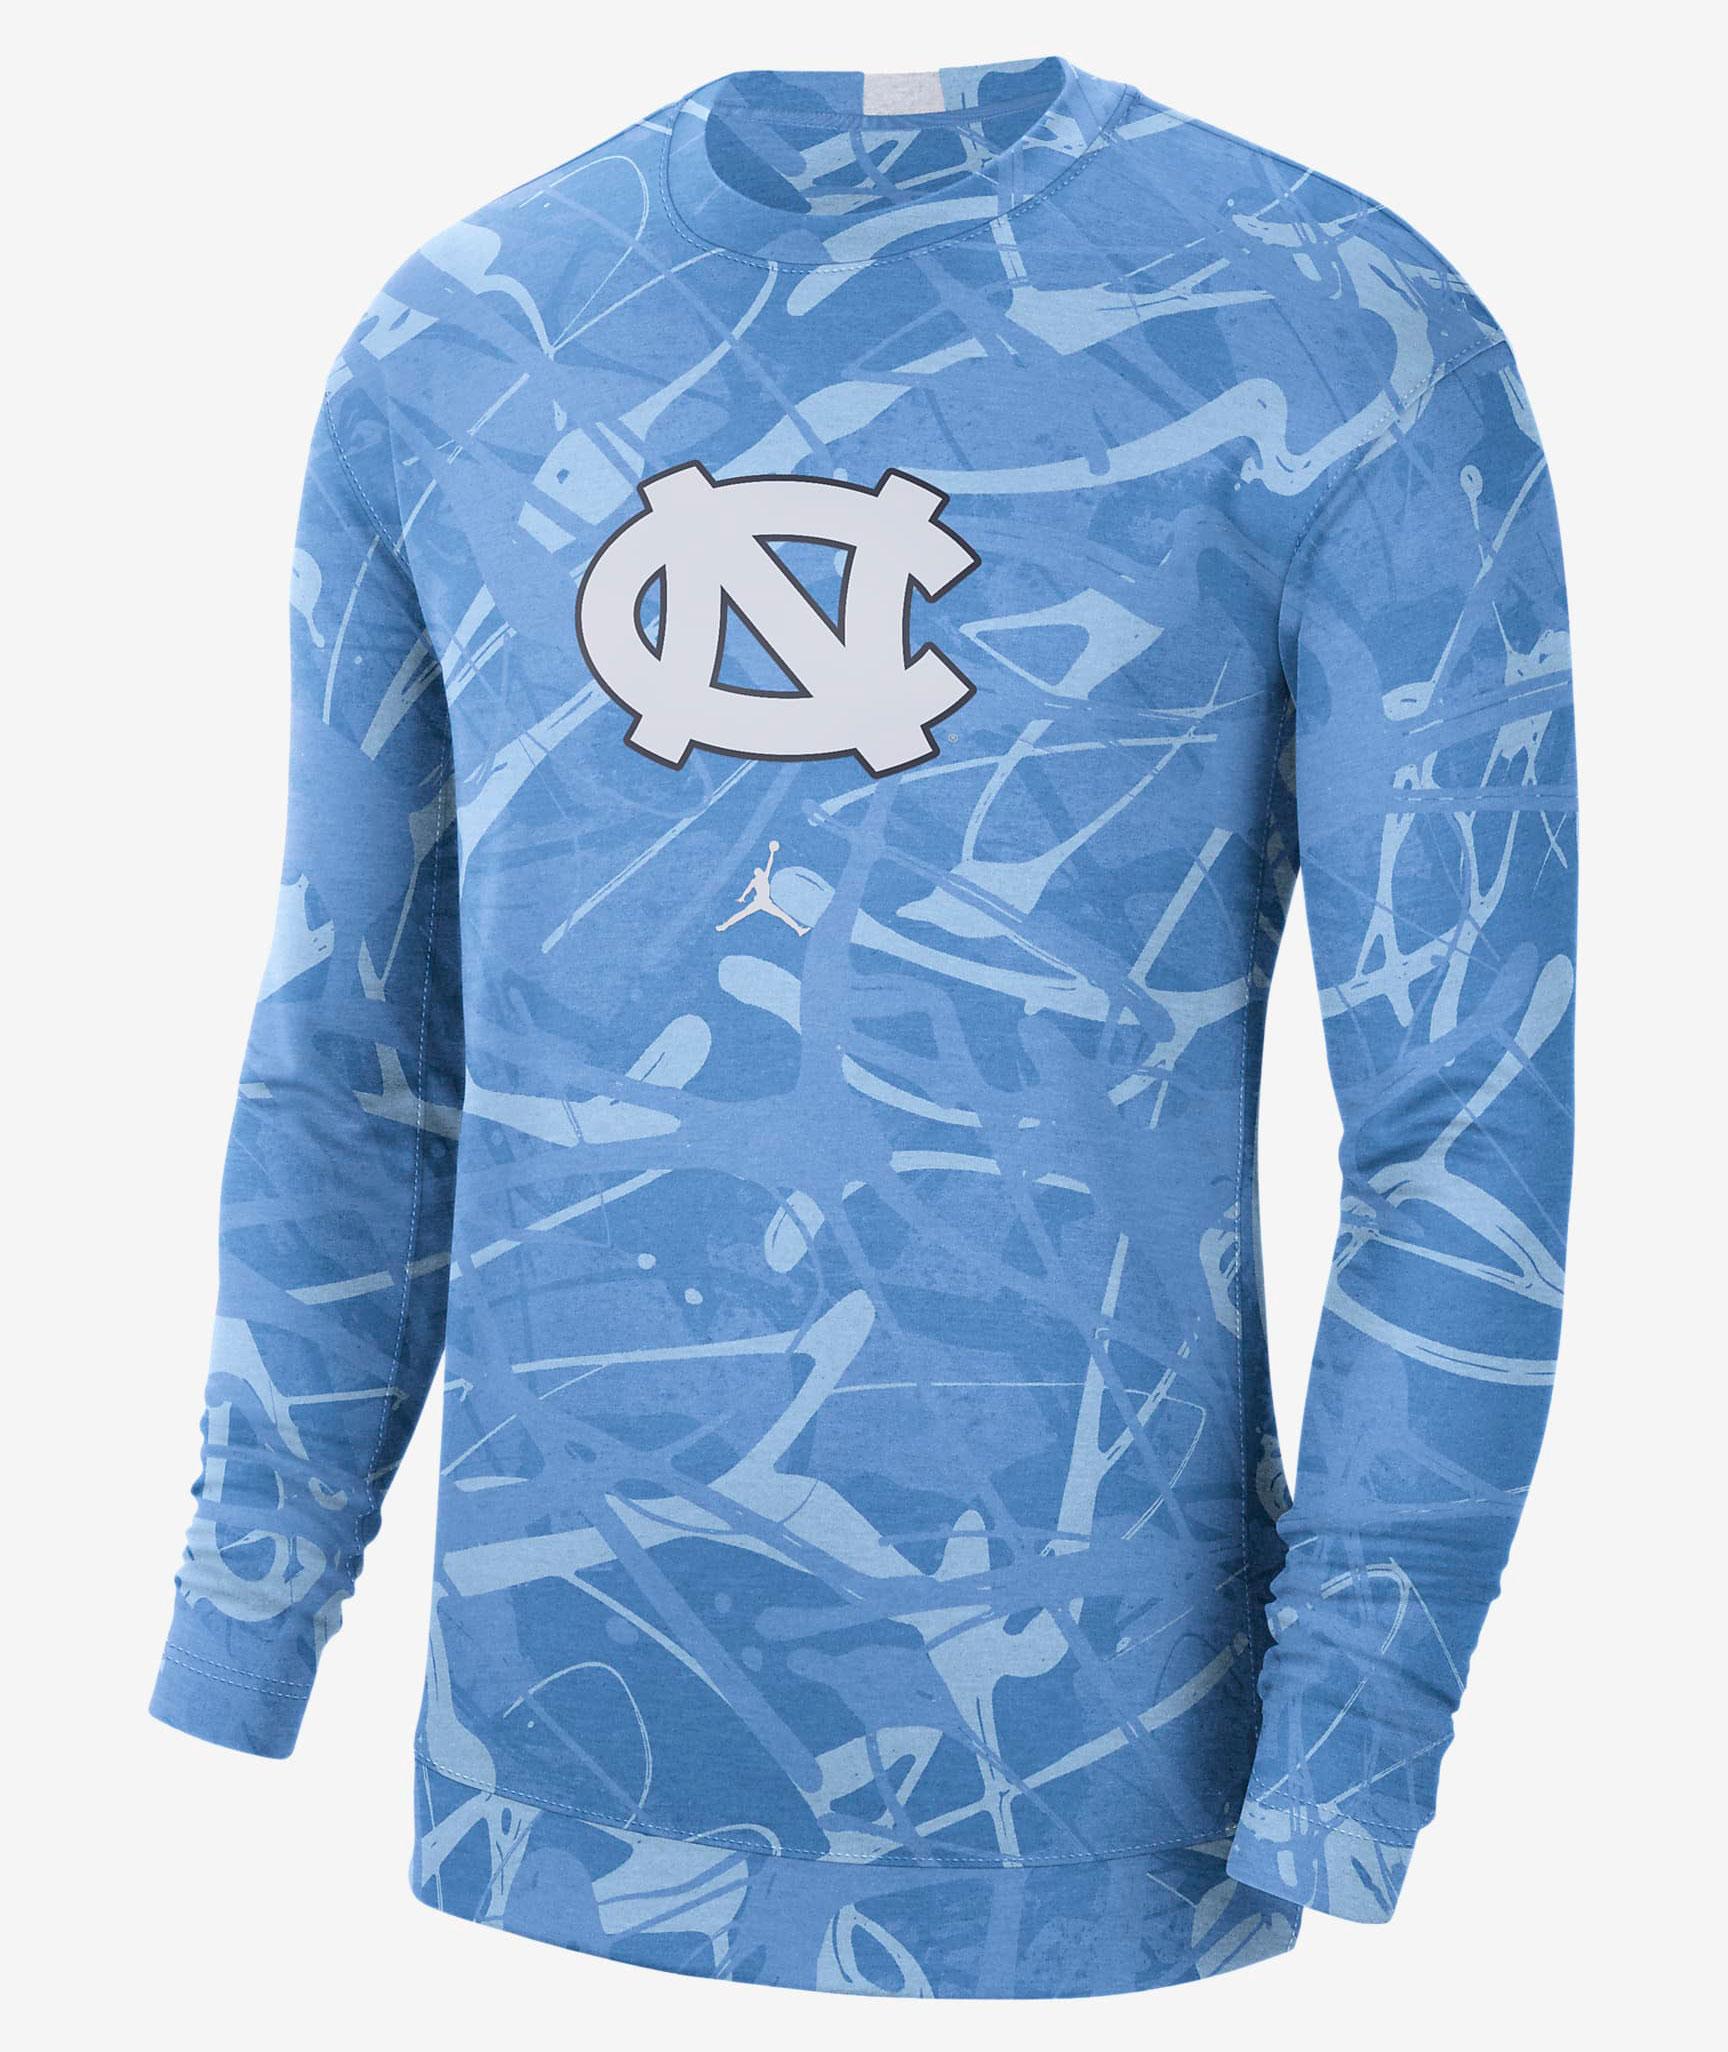 jordan-9-university-blue-unc-long-sleeve-shirt